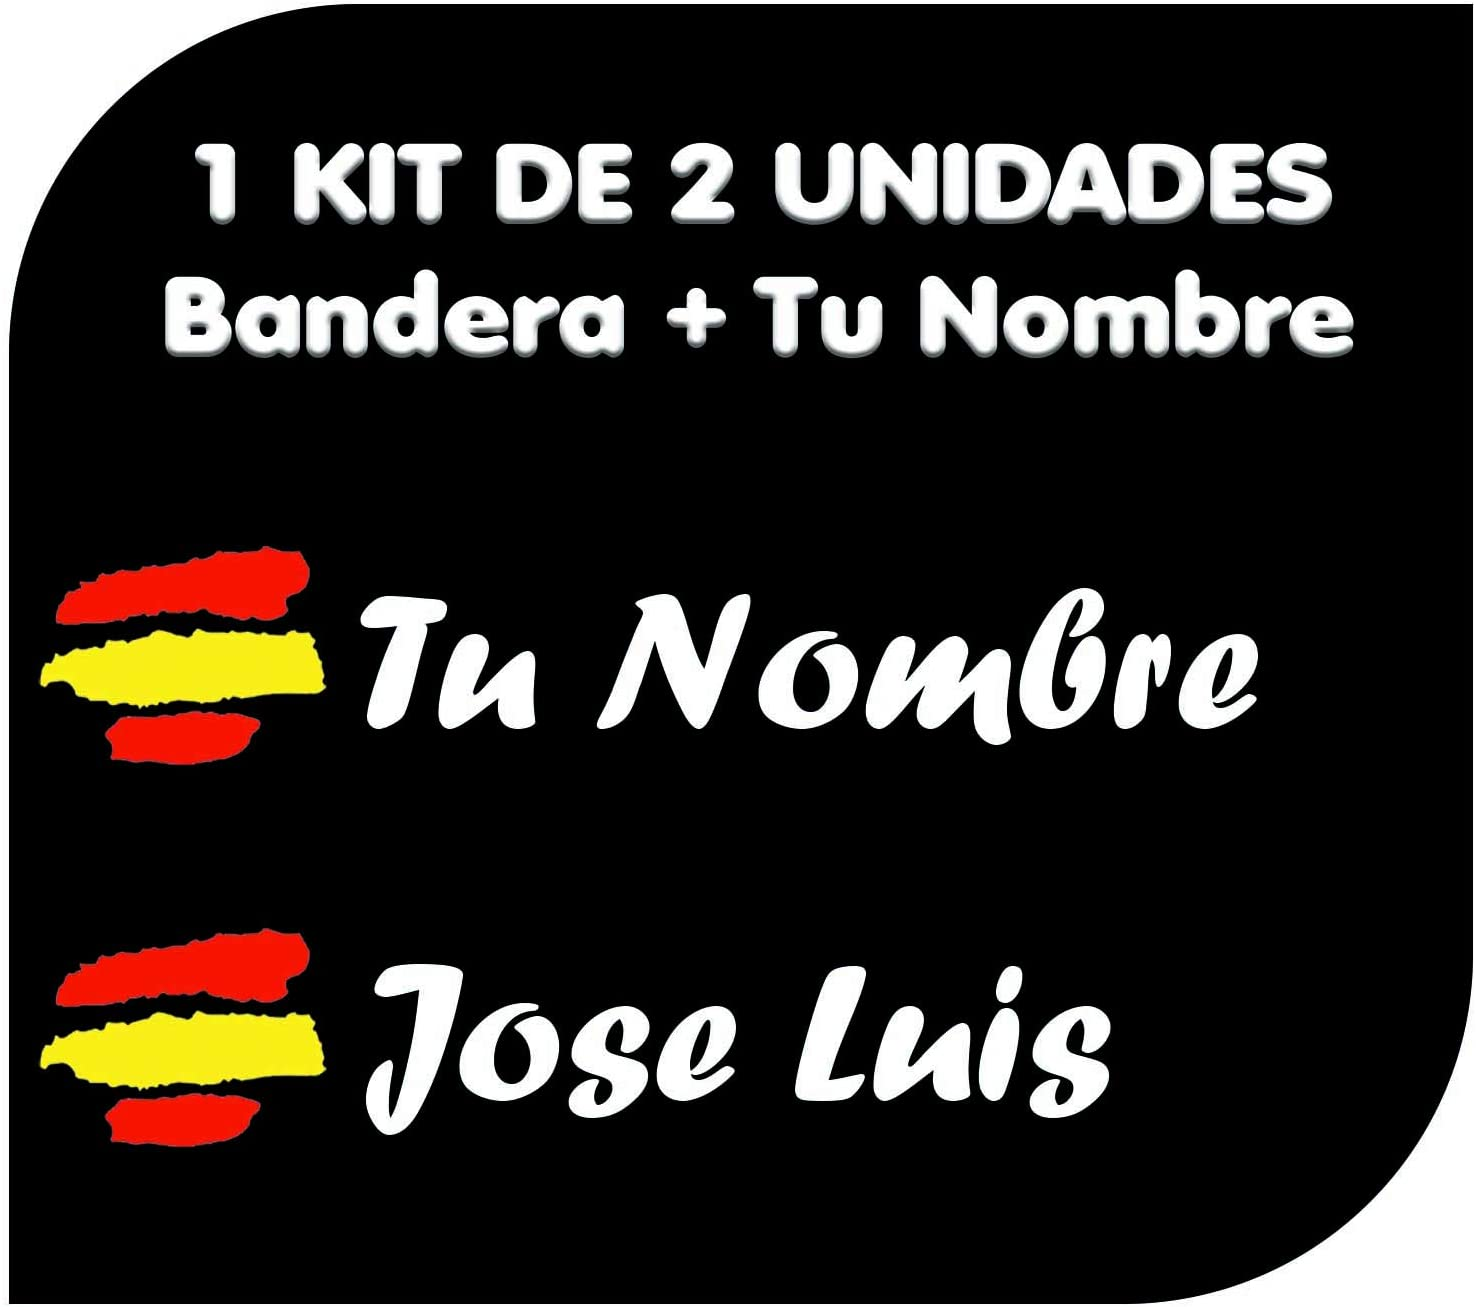 Pegatina Vinilo Bandera España + tu Nombre - Bici, Casco, Pala De Padel, Monopatin, Coche, Moto, etc. Kit de Dos Vinilos (Pack Fuentes 1)